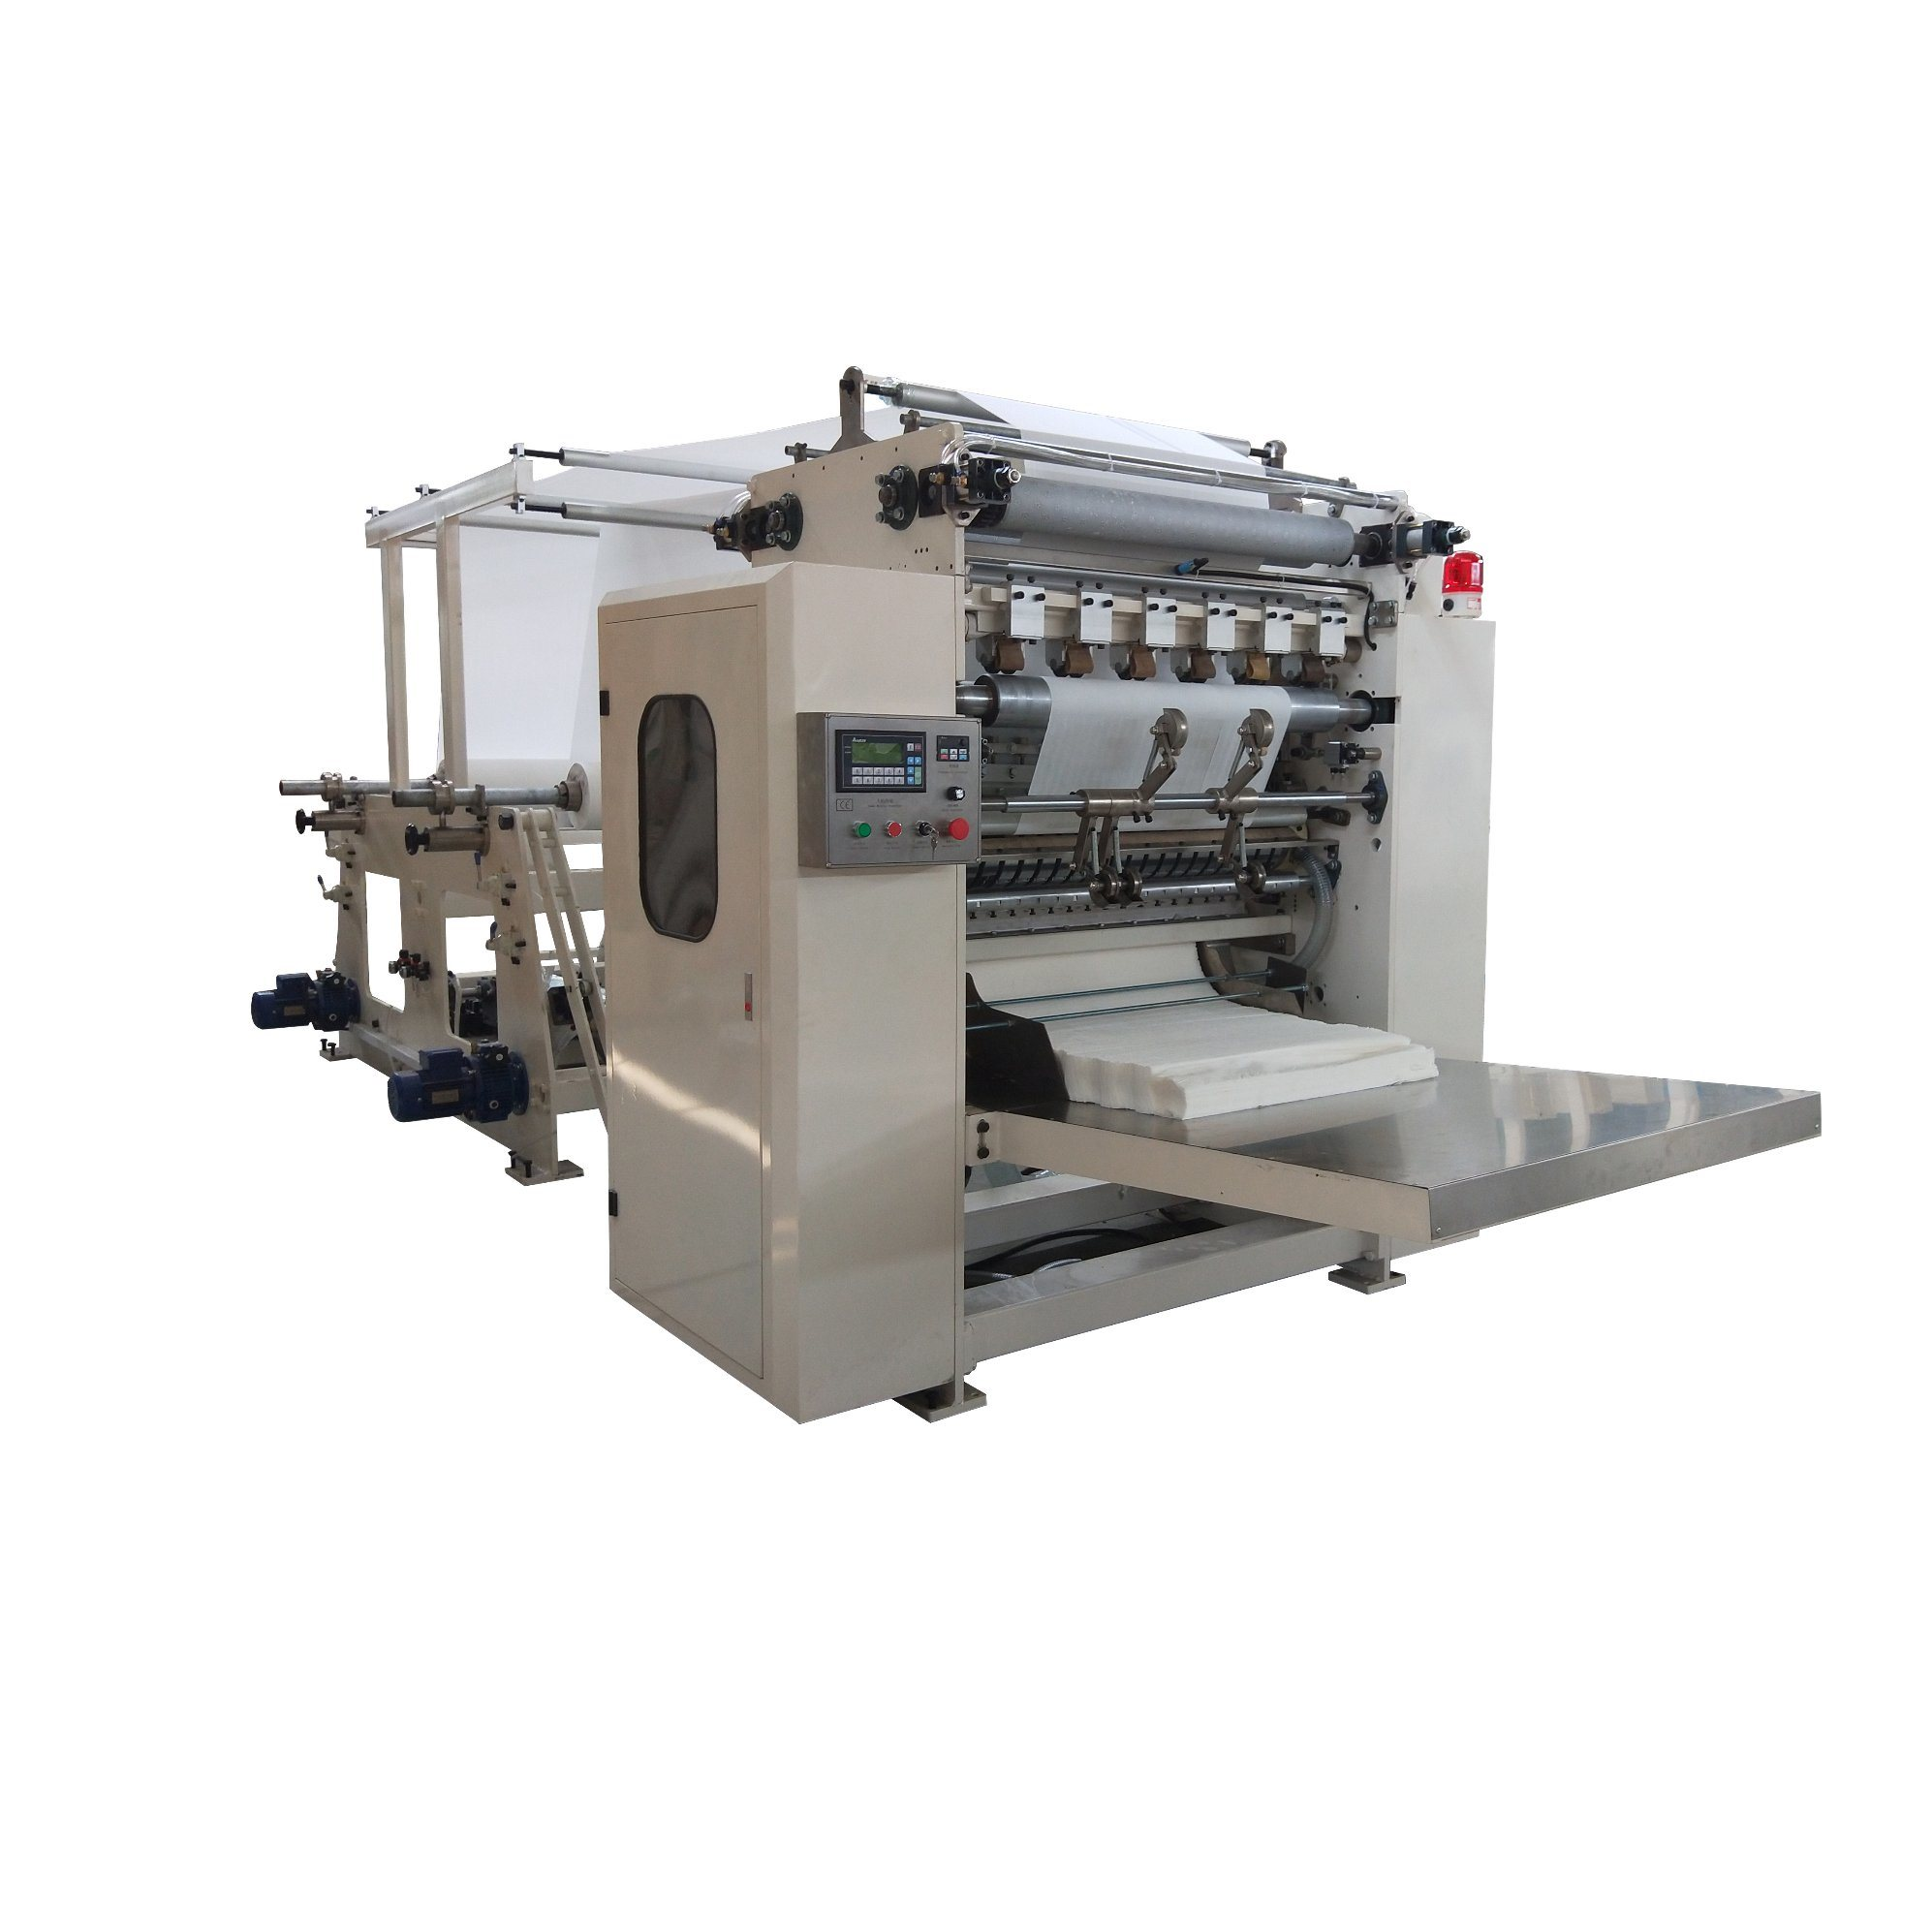 China Automatic Facial Tissue Paper Converting Machine - China Tissue Paper  Converting Machine, Paper Converting Machine